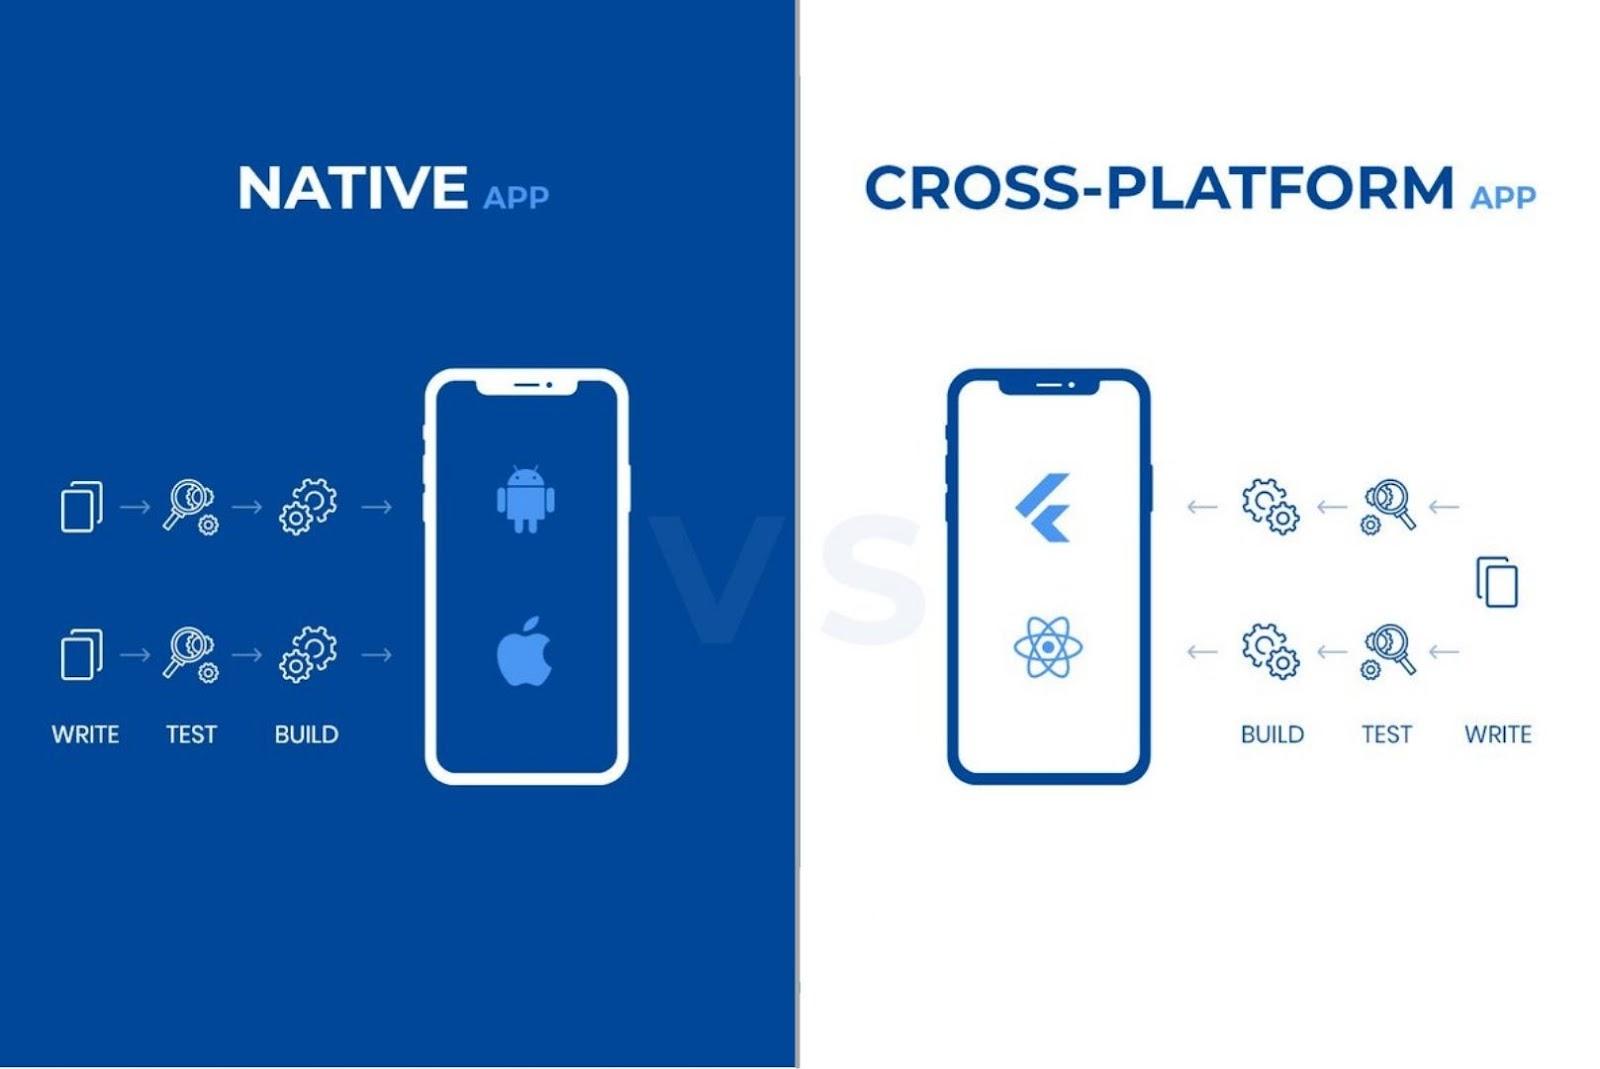 Increase the efficiency of Native app development